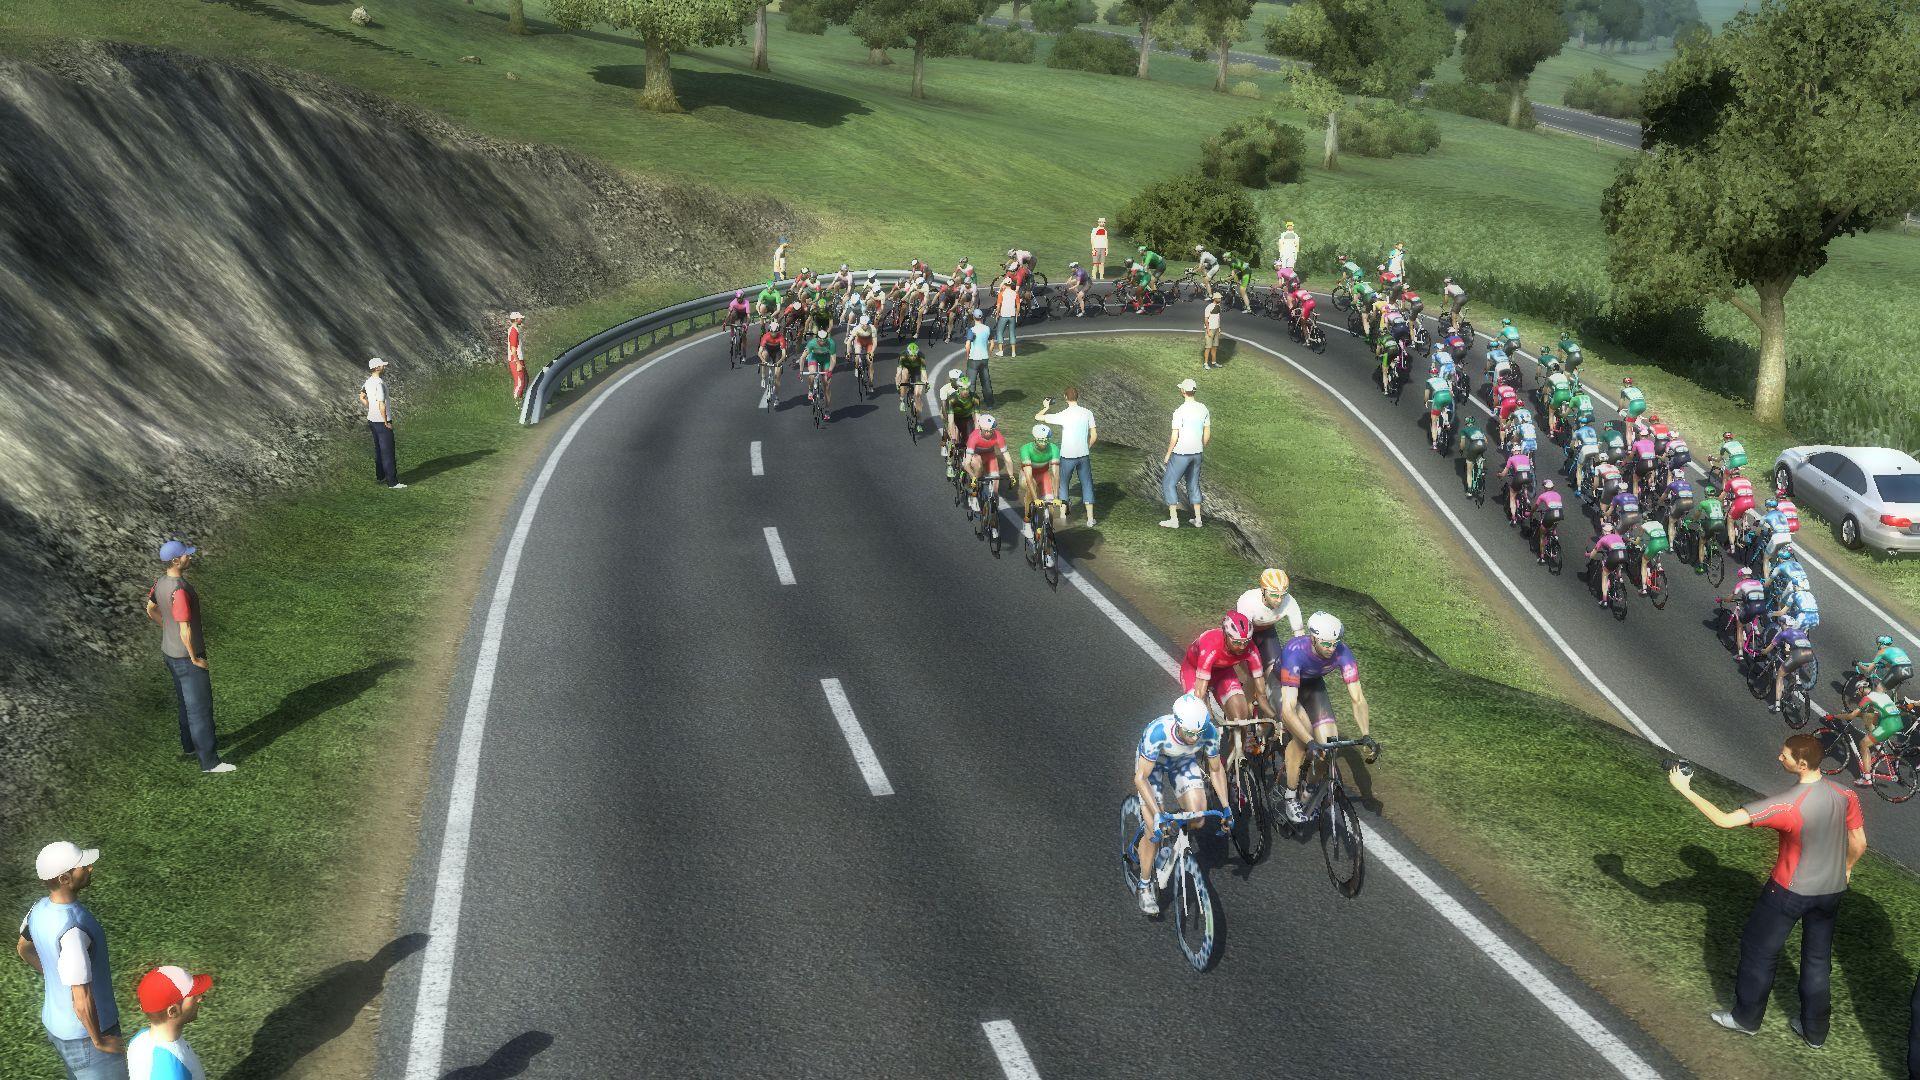 pcmdaily.com/images/mg/2018/Races/C2HC/Zuri/Zuri%2011.jpg